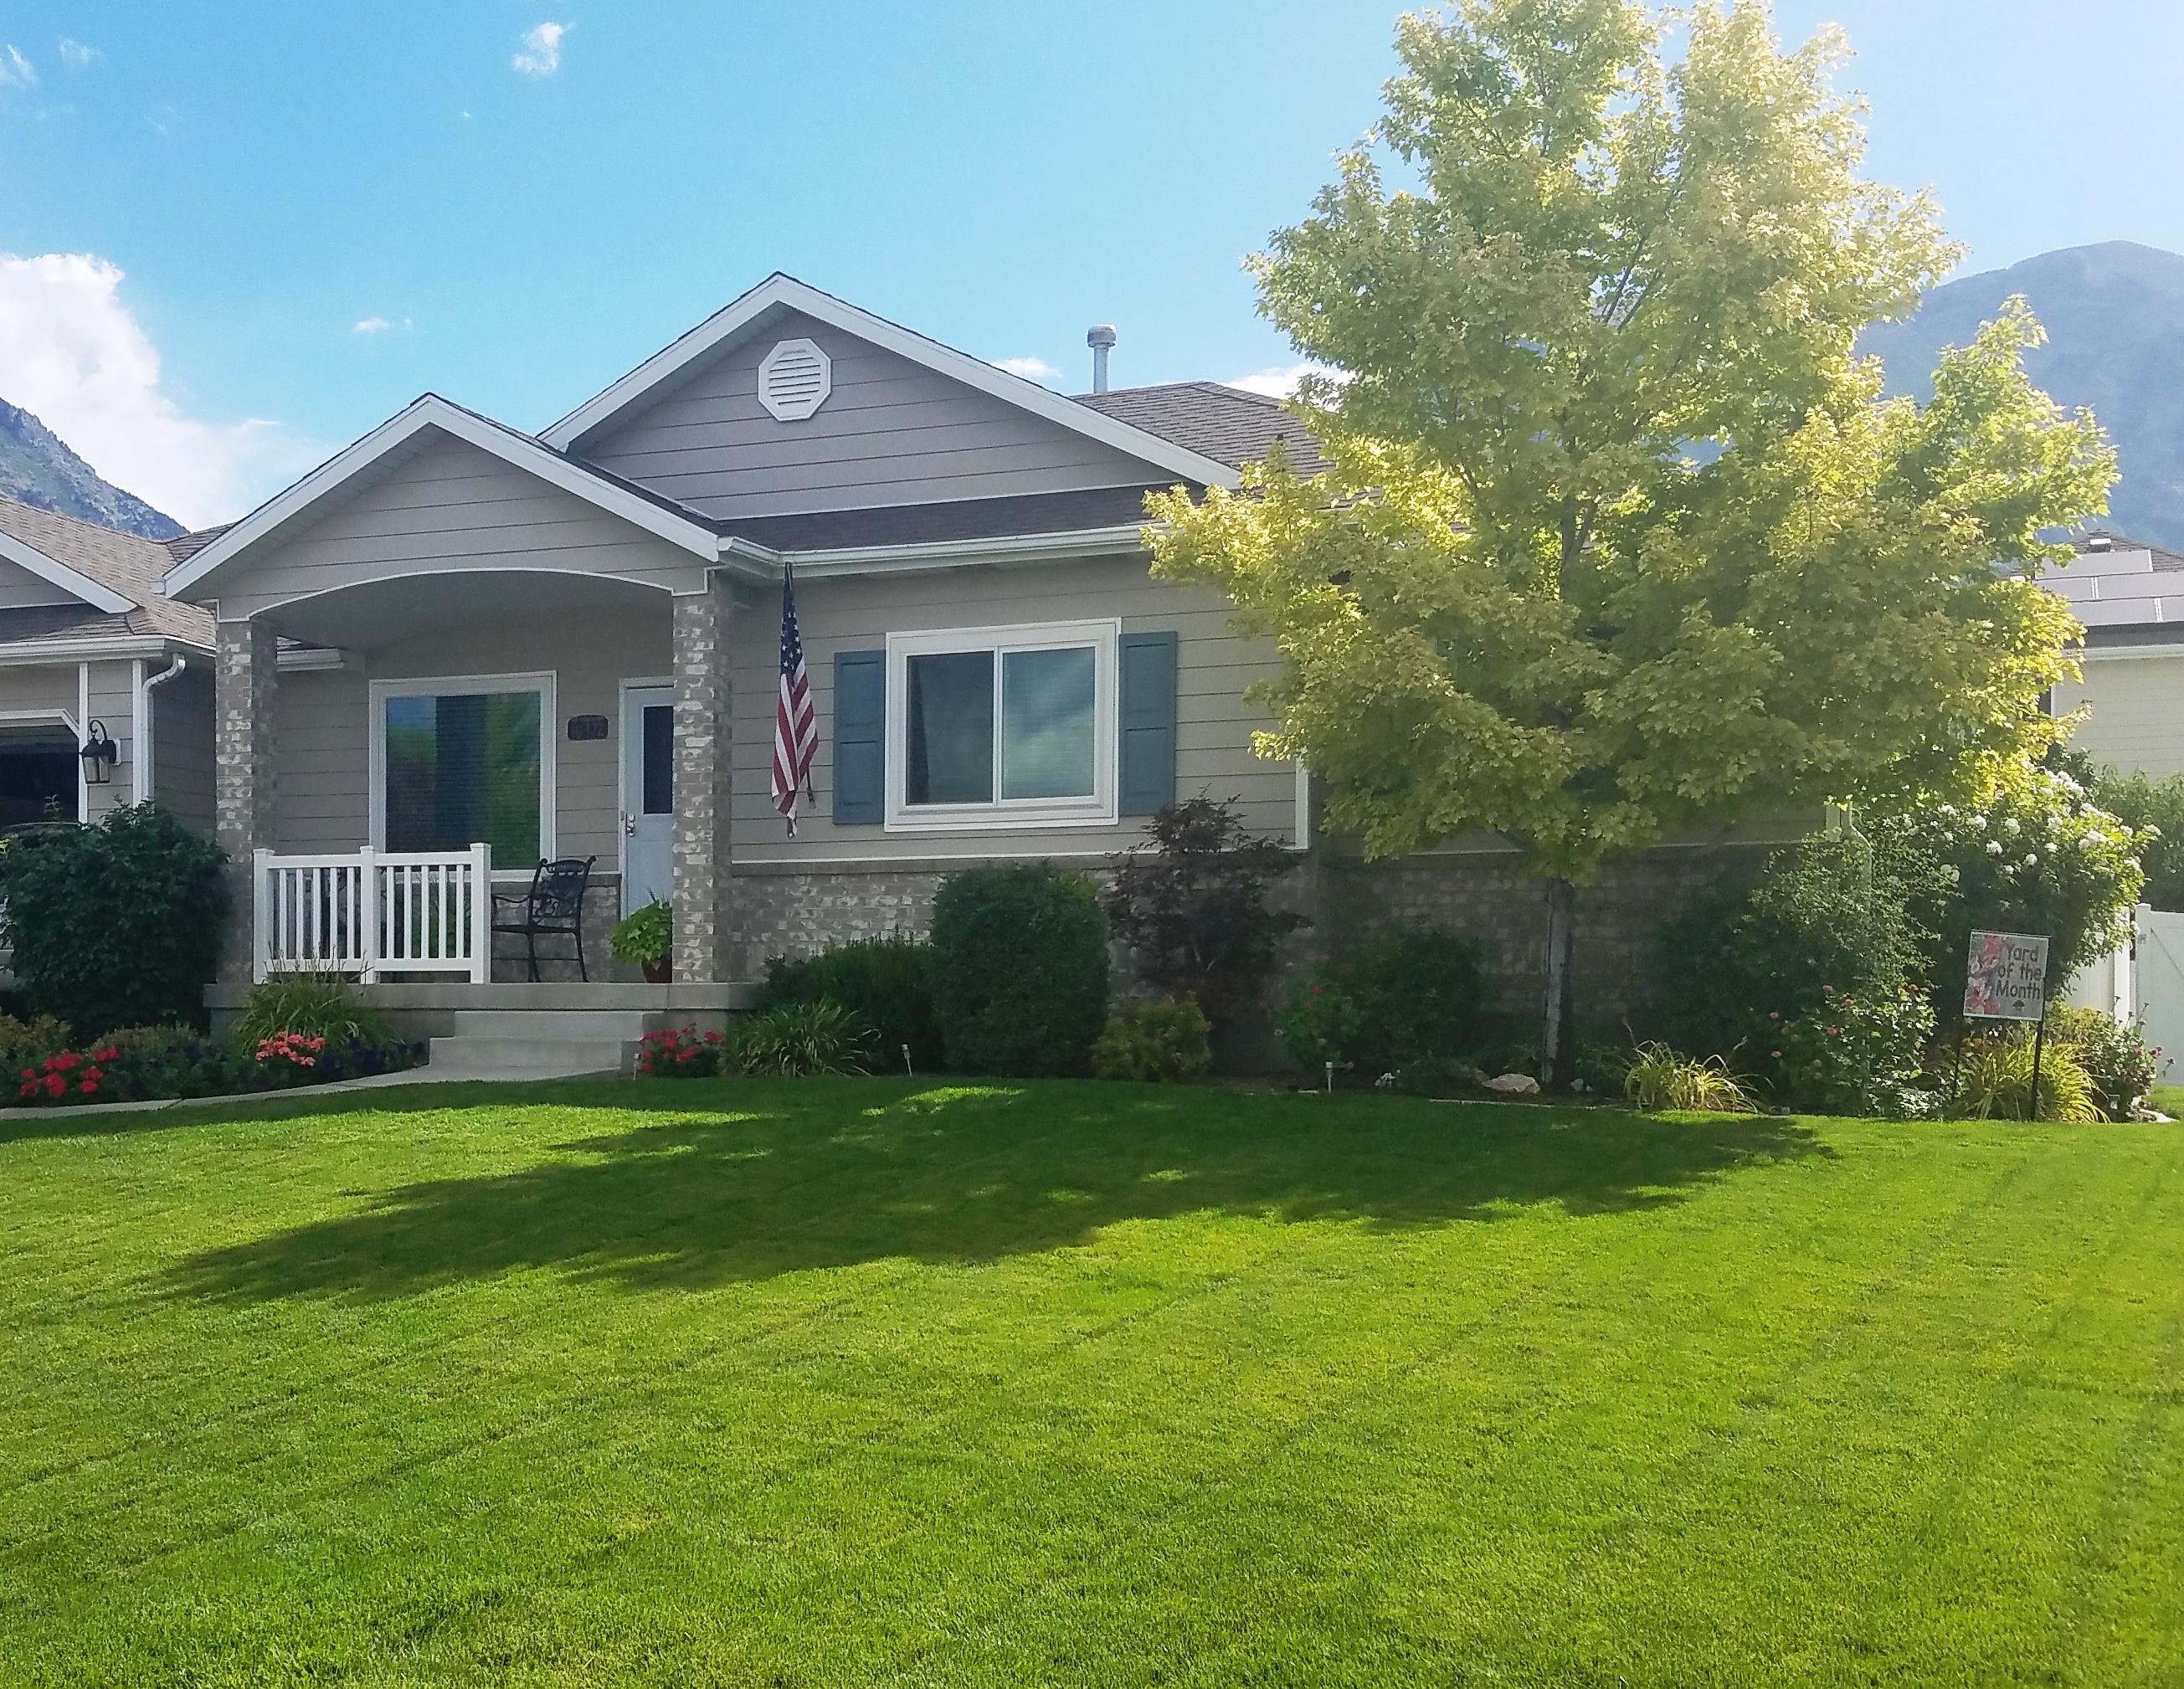 The Gunnarson Residence, 10372 N Waterbury Circle